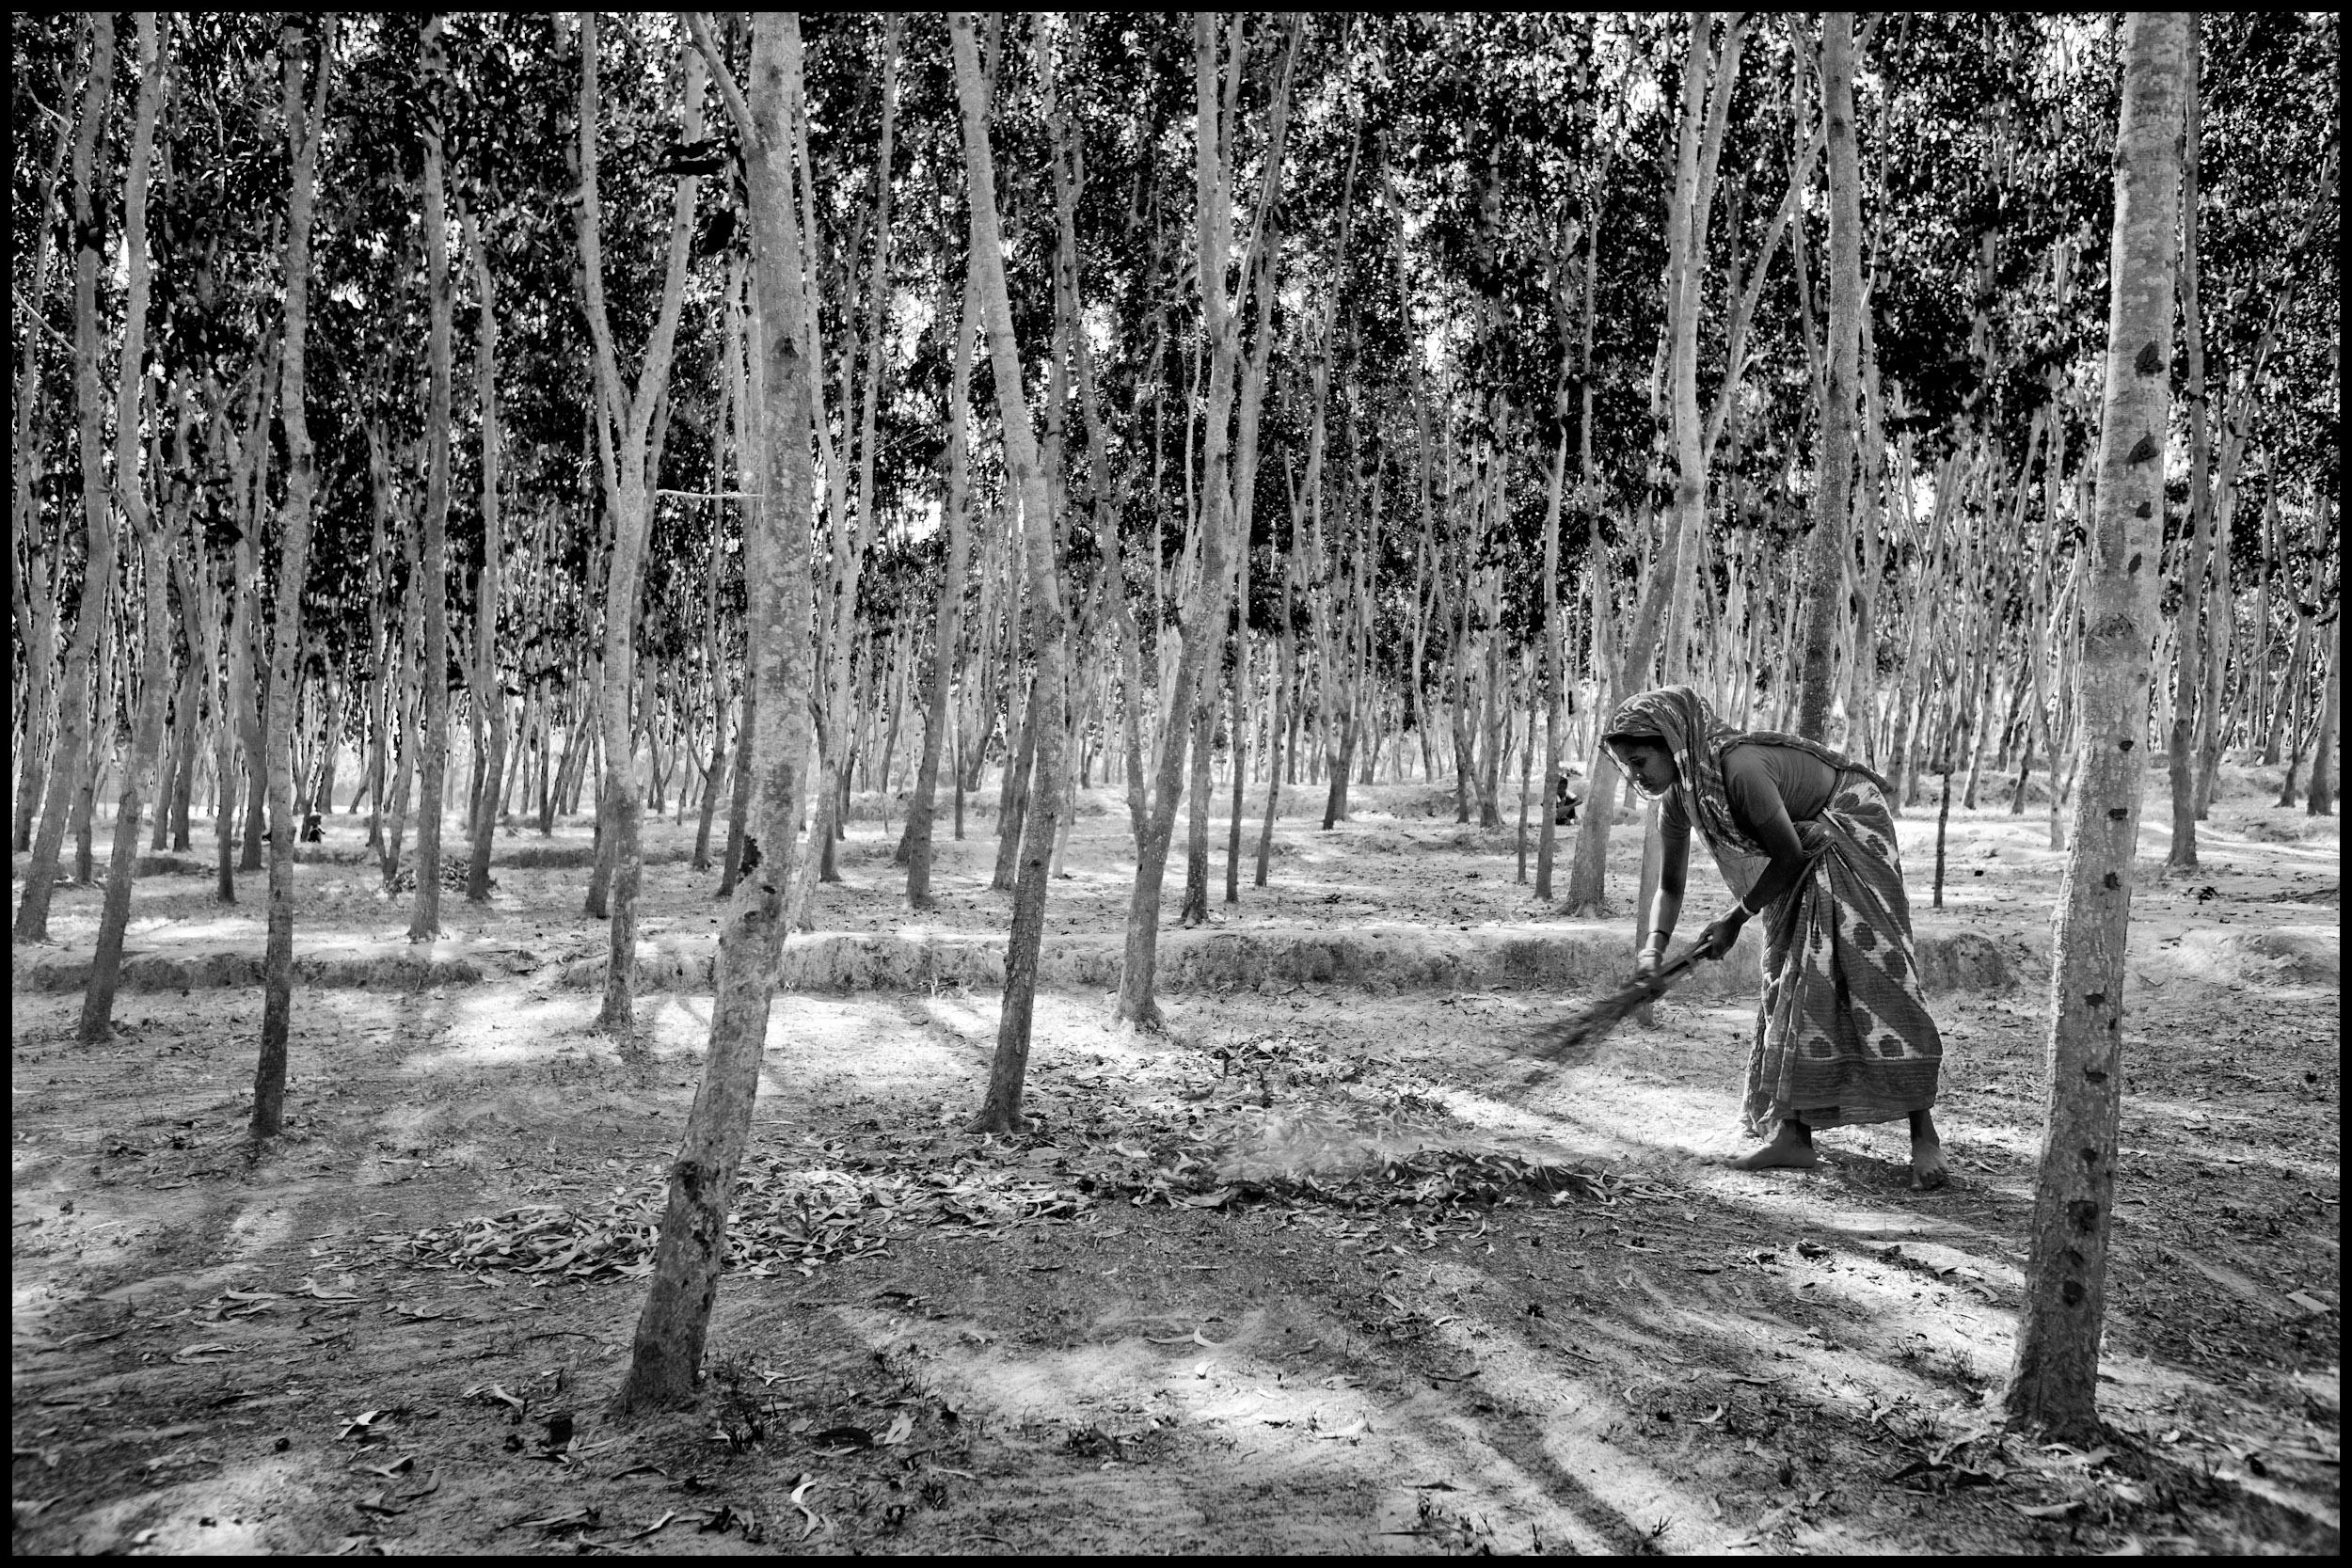 d218fa2d2604 ZORIAH - A PHOTOJOURNALIST AND WAR PHOTOGRAPHER S BLOG  Rohingya ...